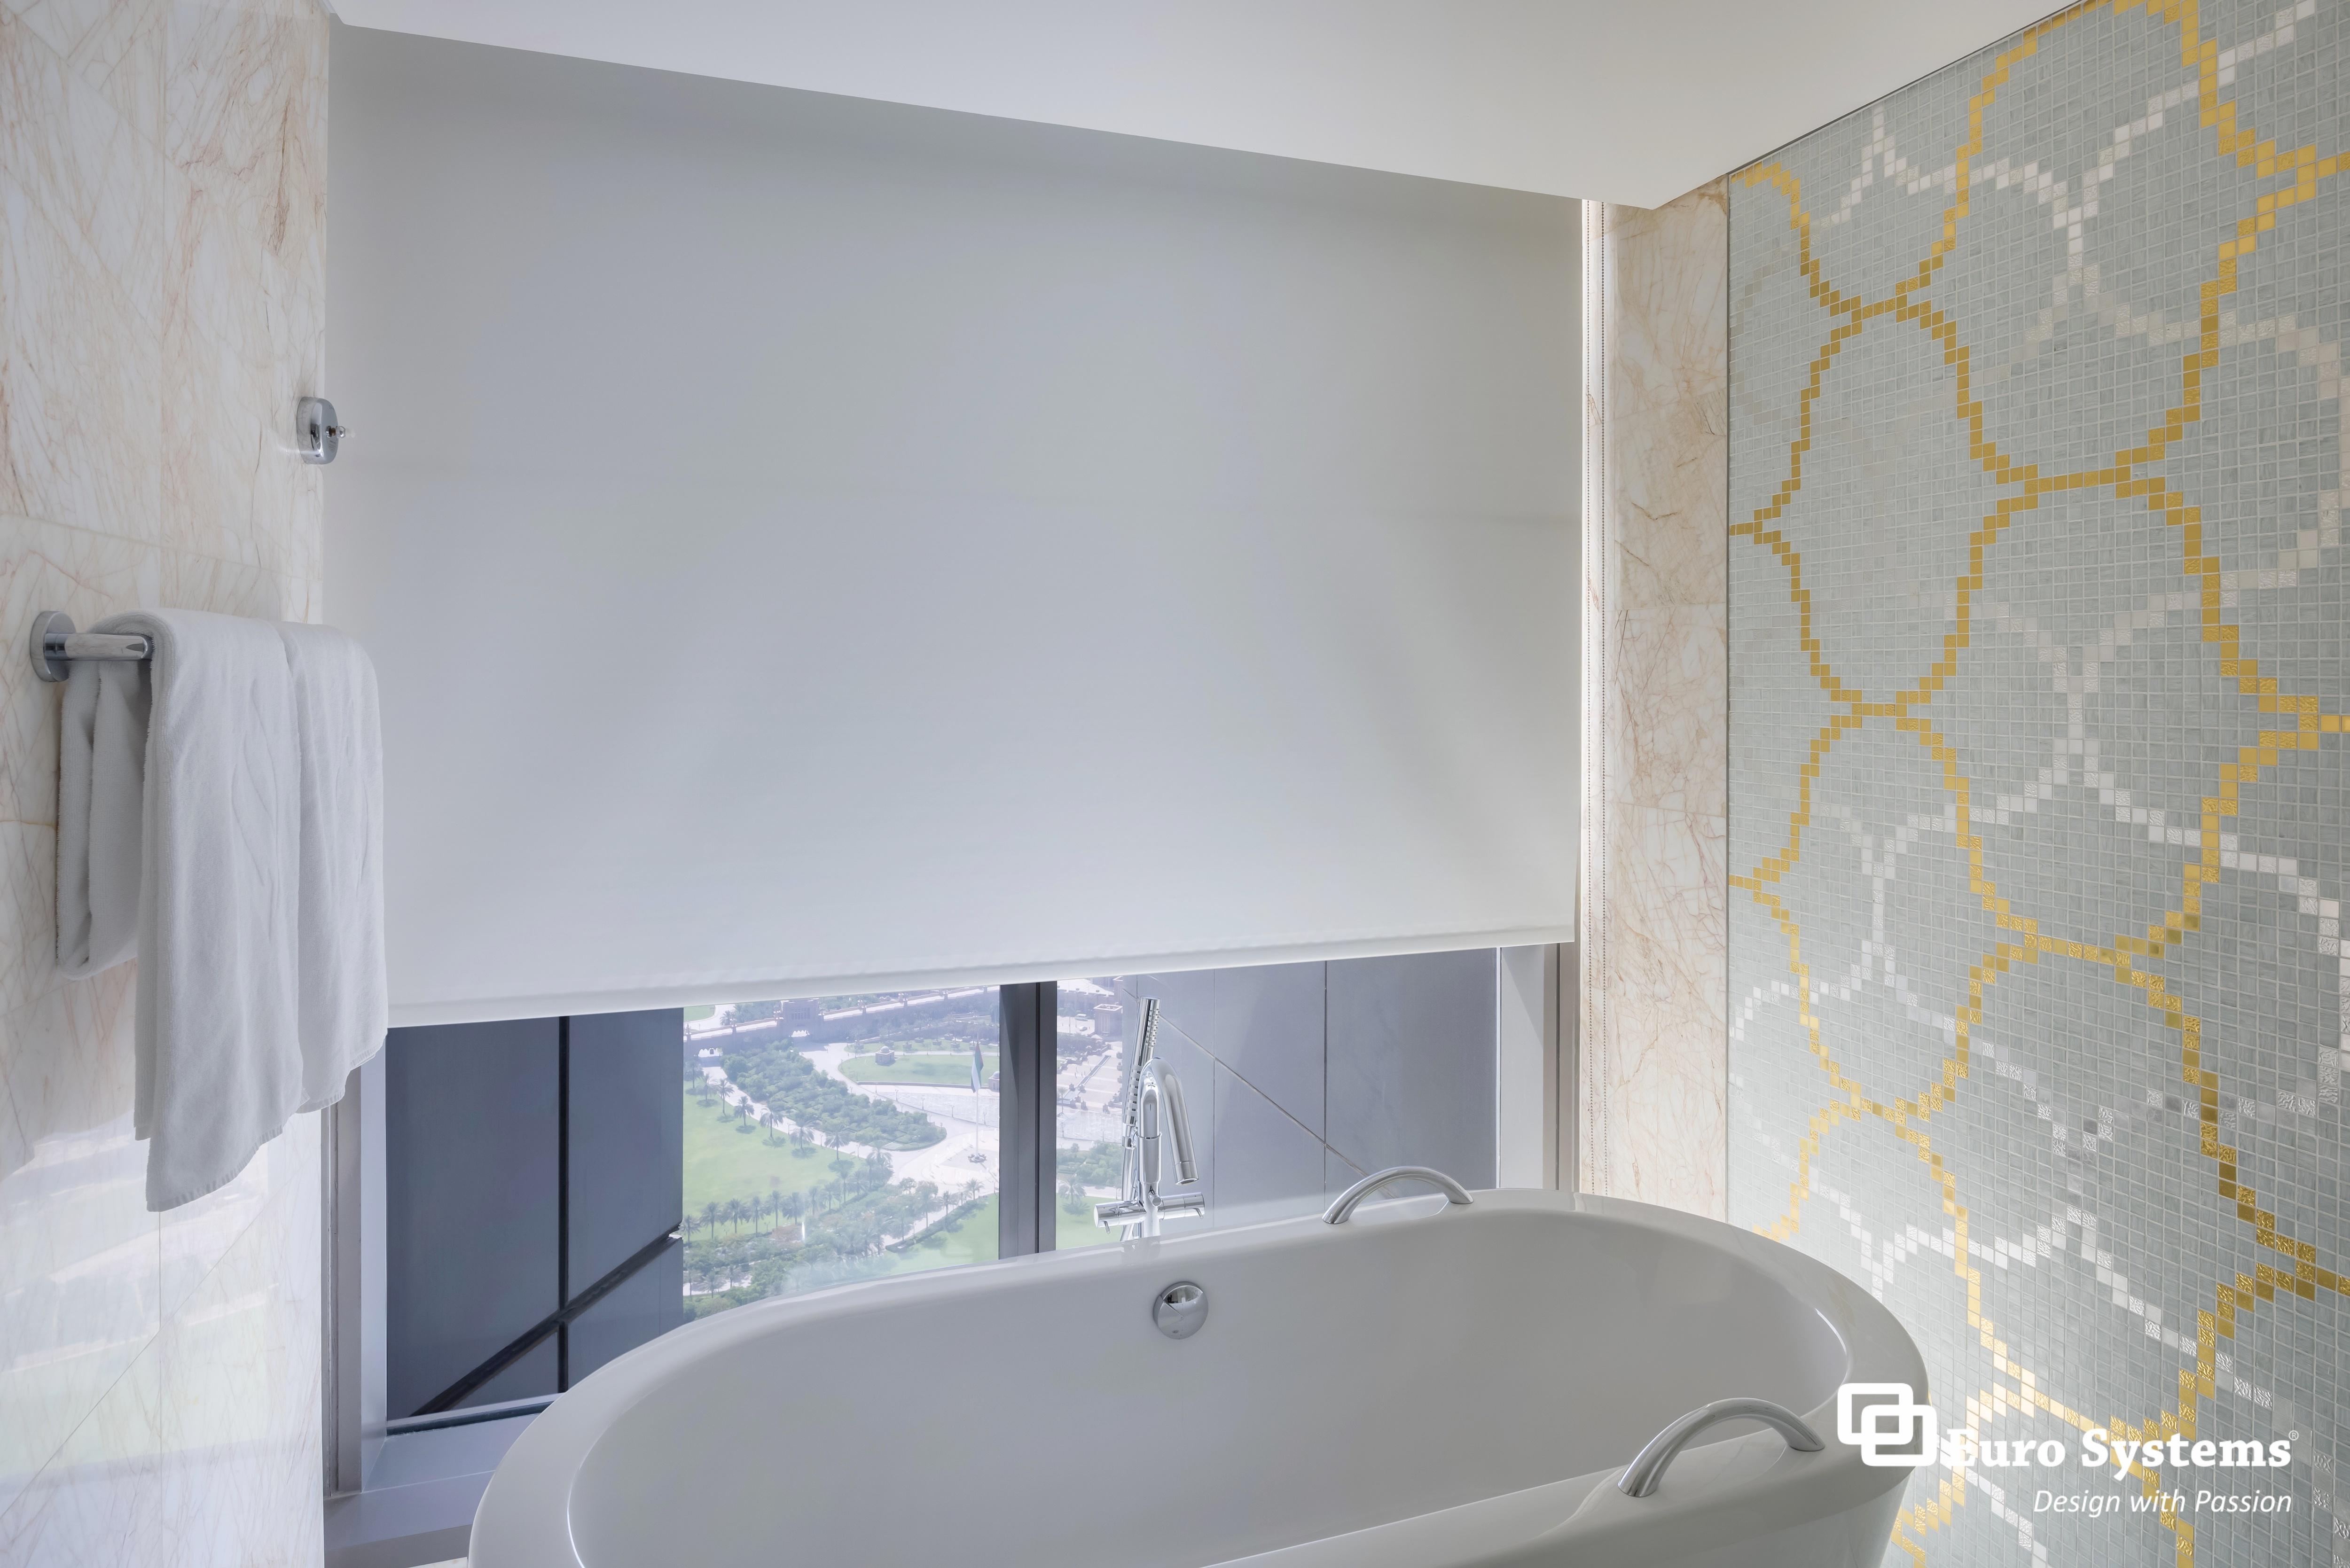 Etihad Towers Bathroom2 - High Resolution